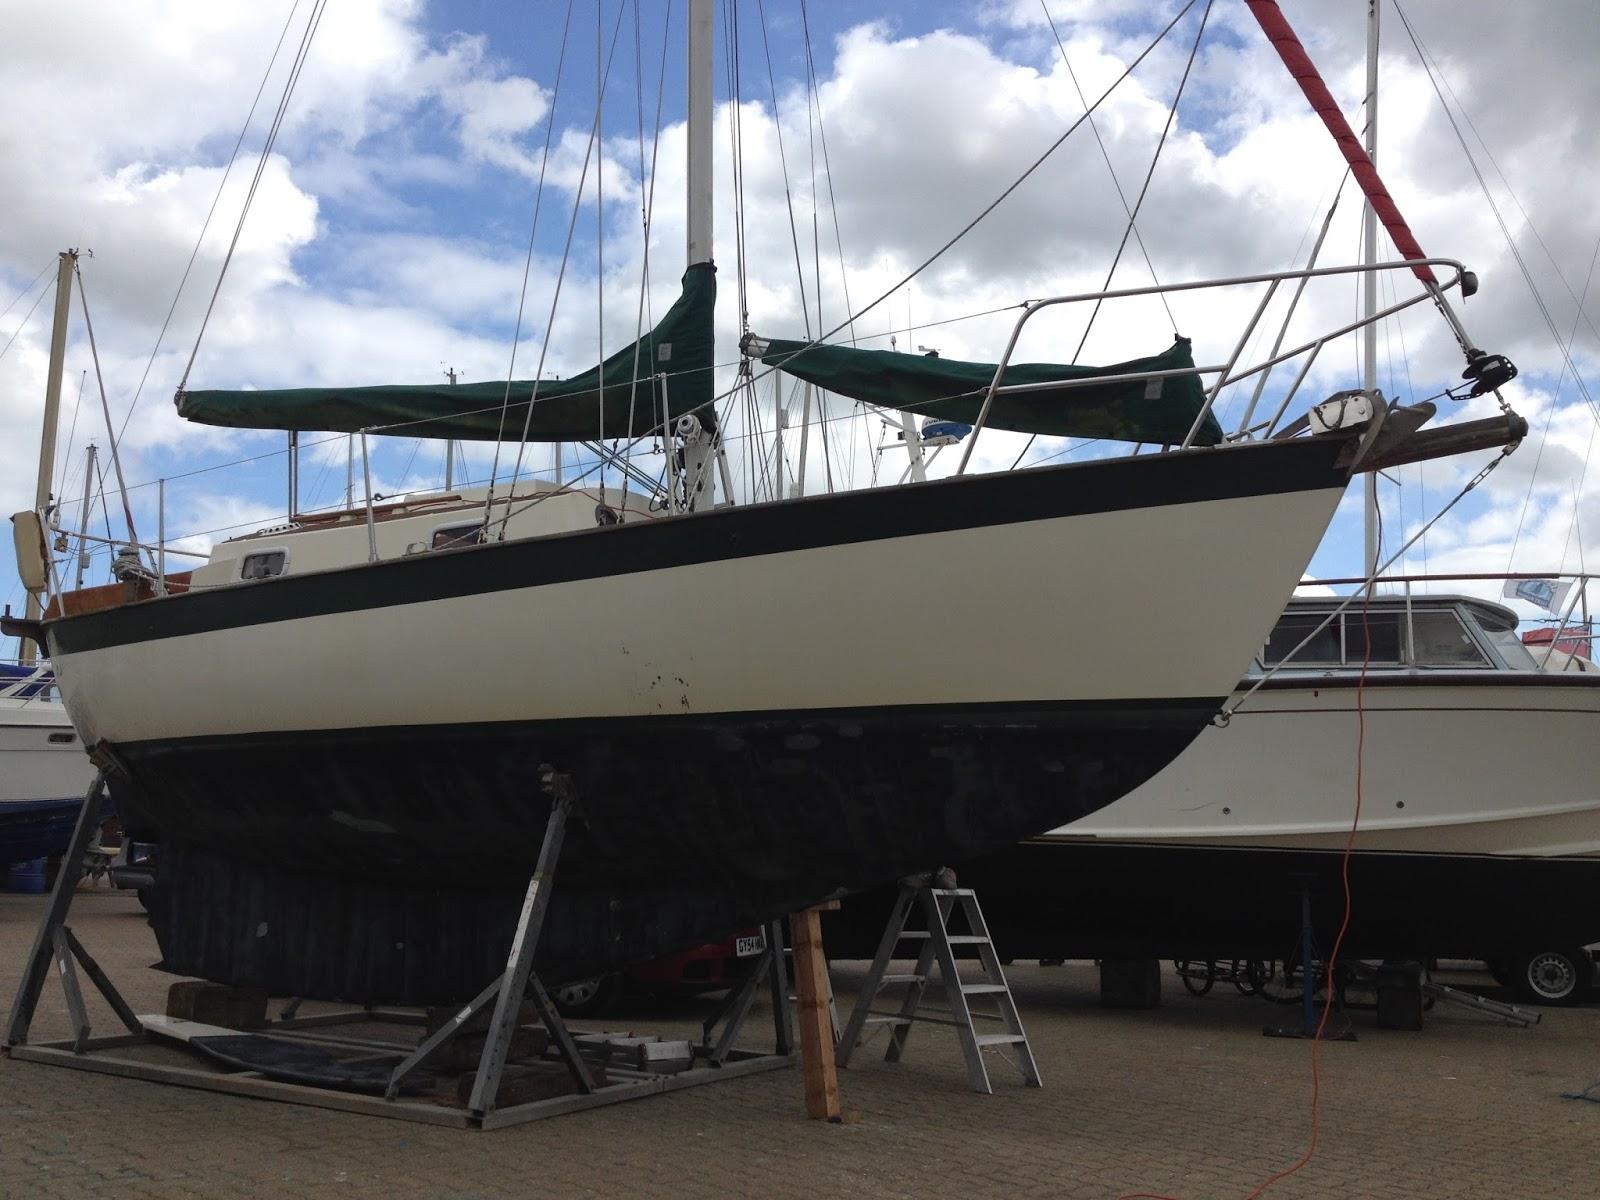 Bill's Log: Victoria Frances 28 Cruising Yacht